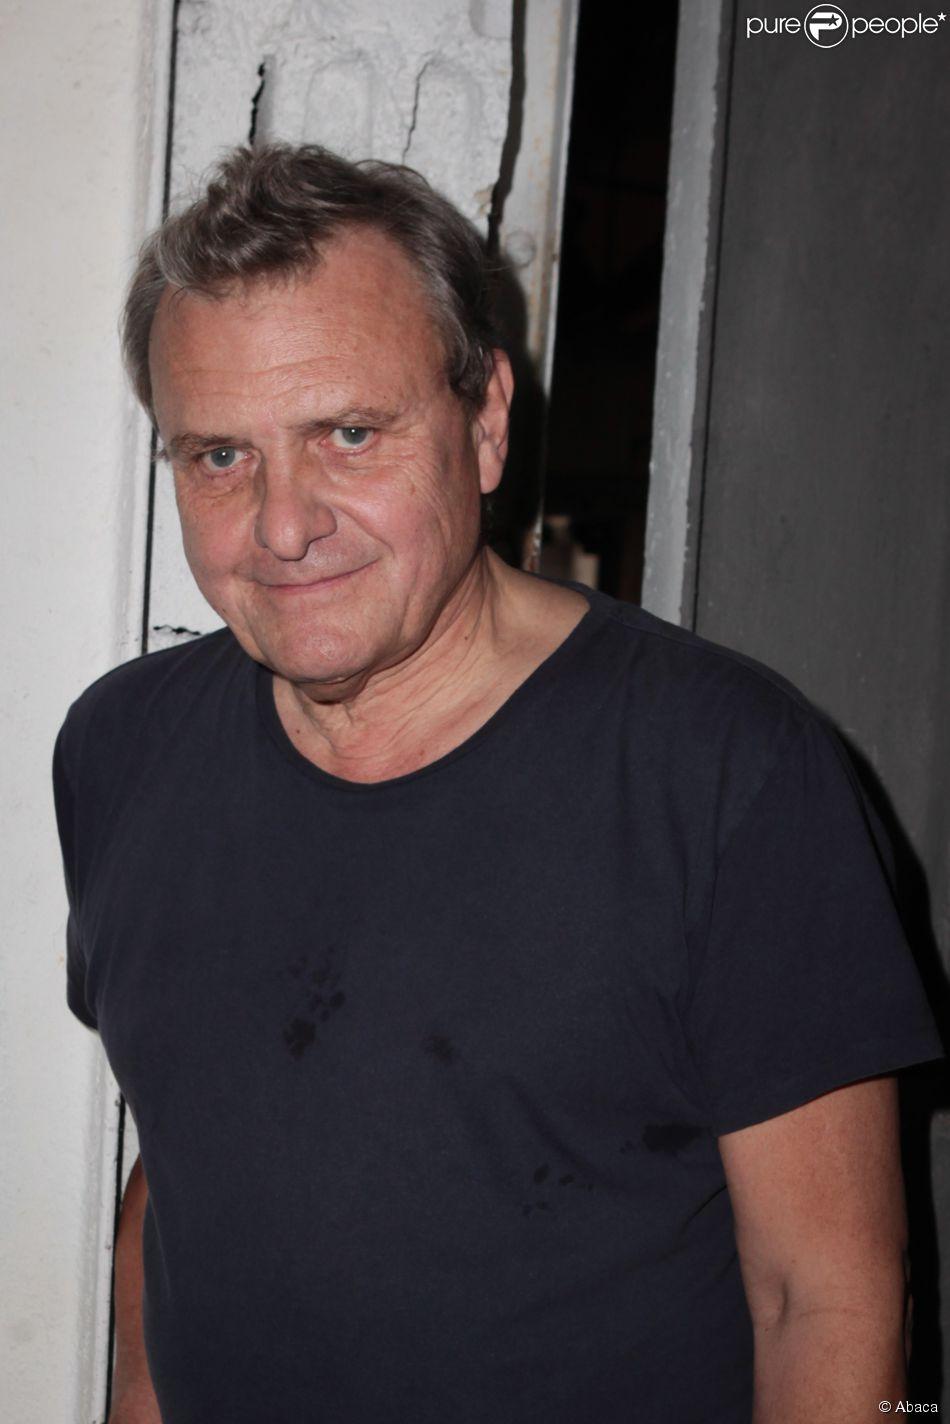 Jean charles de castelbajac attending his spring summer for Garage jean charles nacci